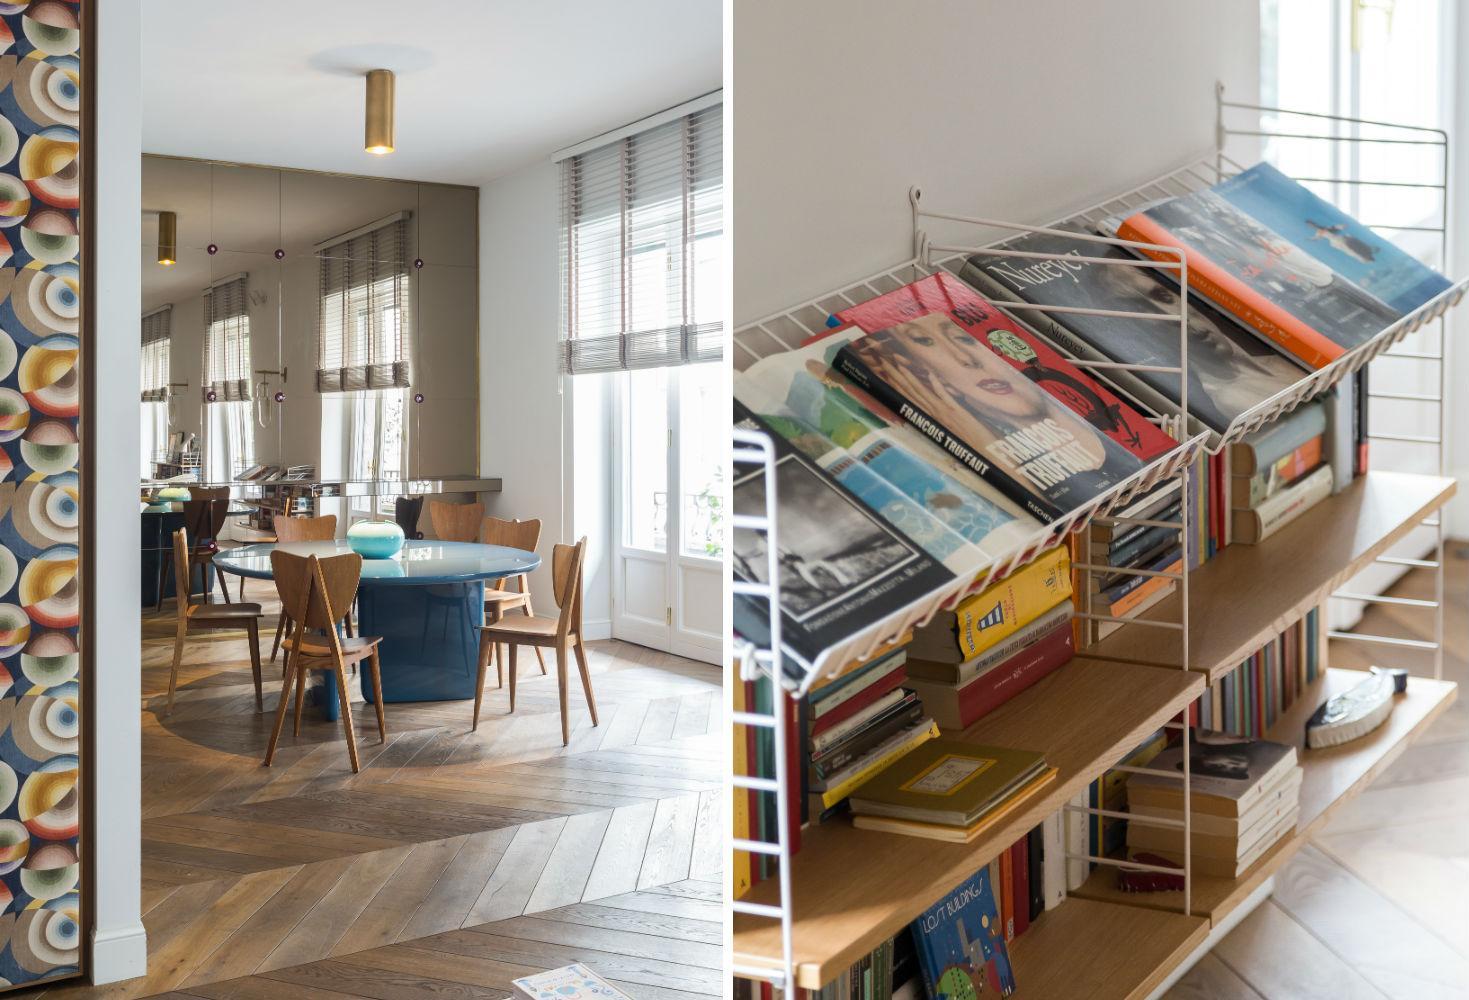 Westwing, Naj Oleari, Casa, Colore, Design, Passione, Vintage